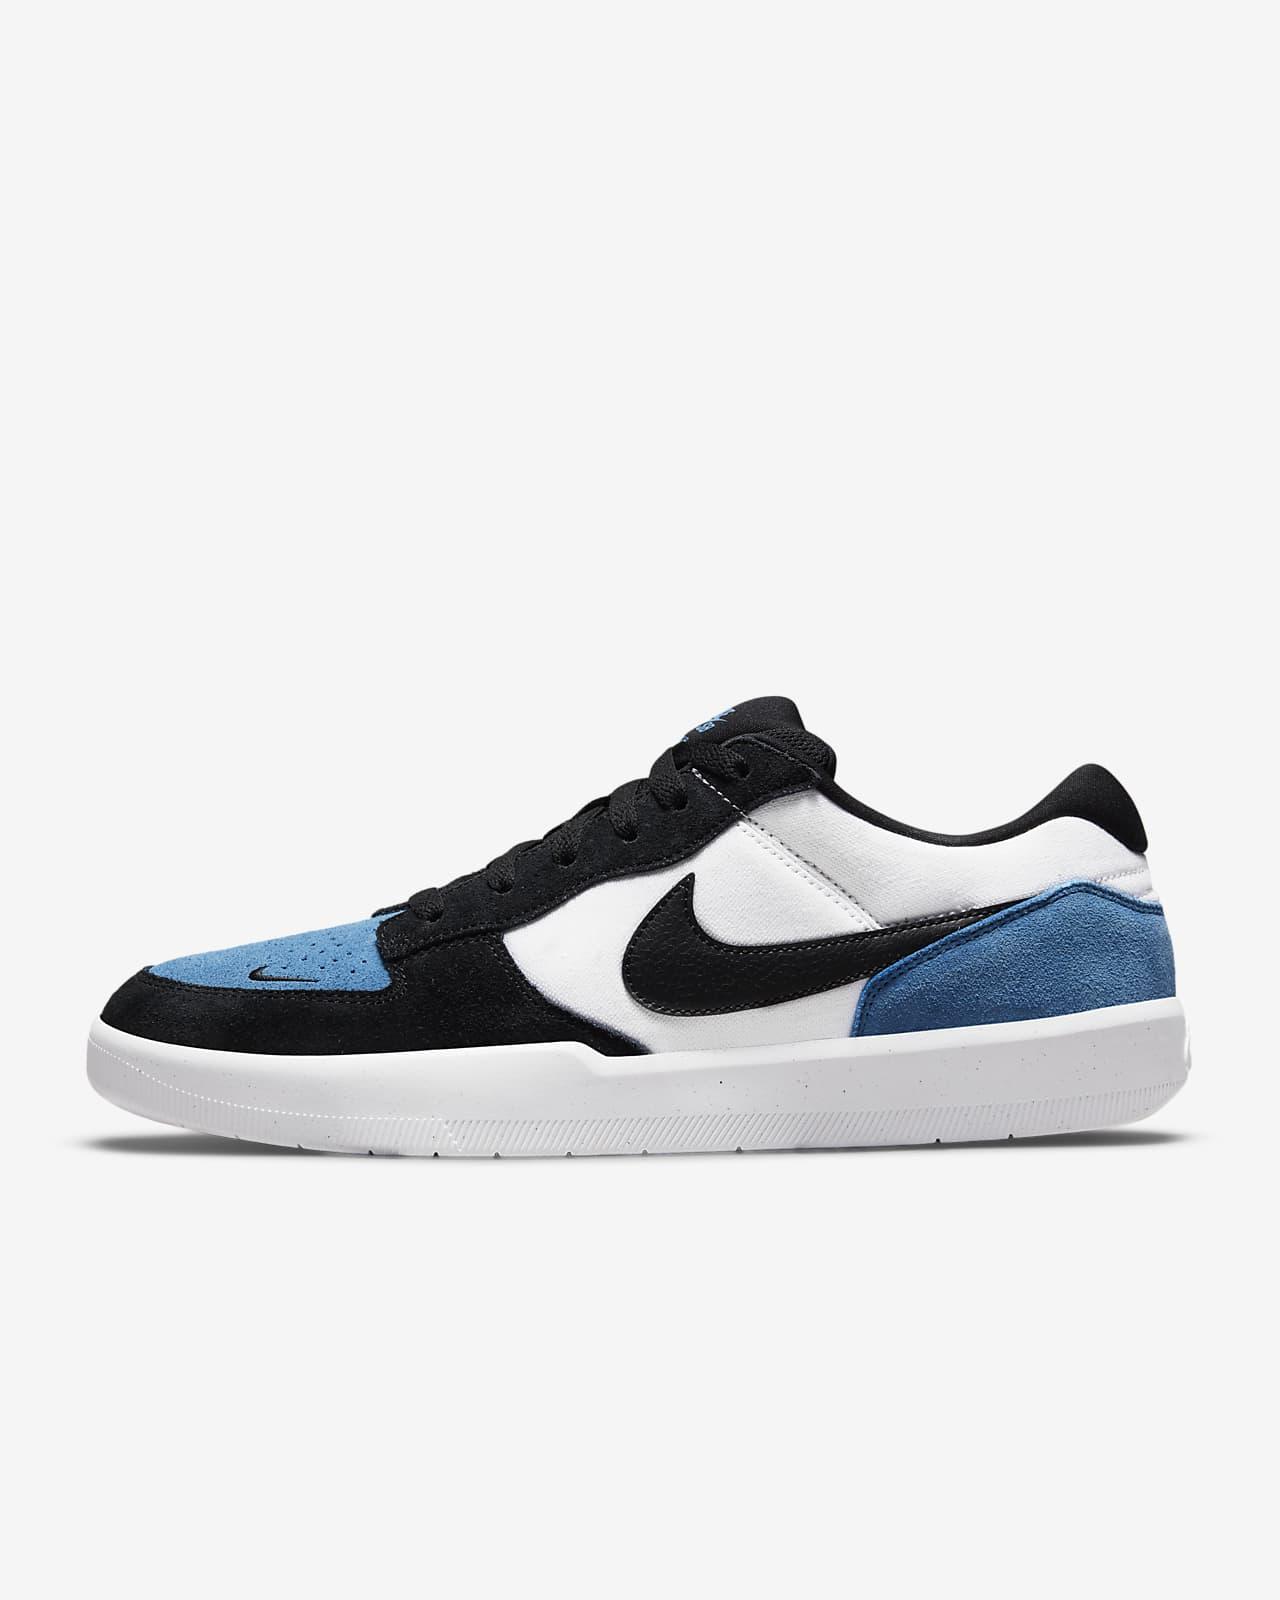 Calzado de skateboarding Nike SB Force 58